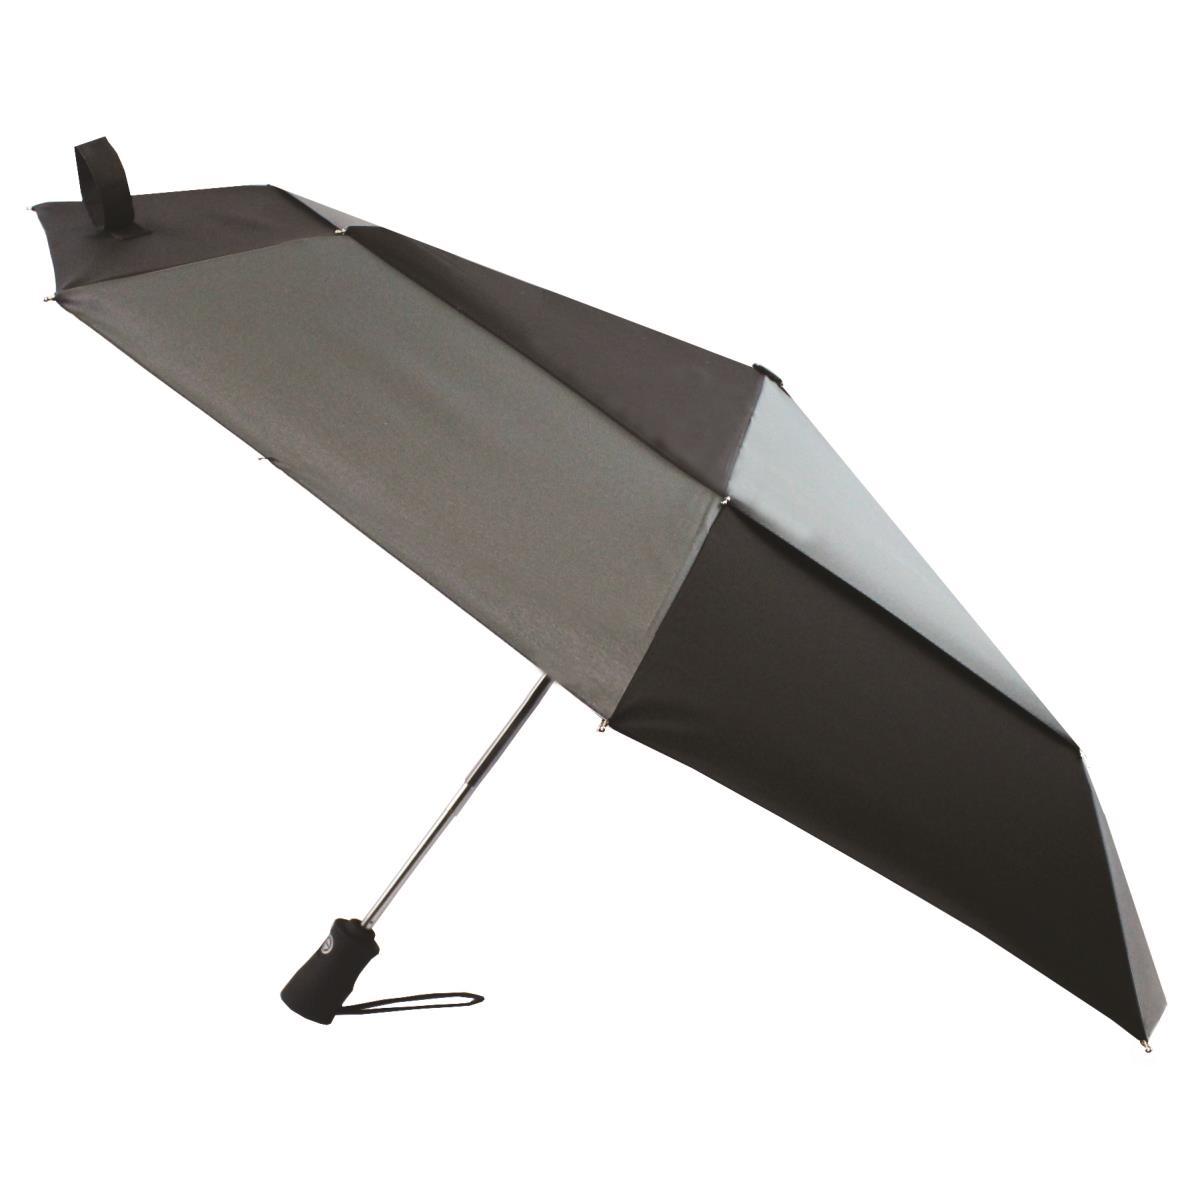 Totes wonderlight auto double canopy umbrella black grey for Canopy umbrella